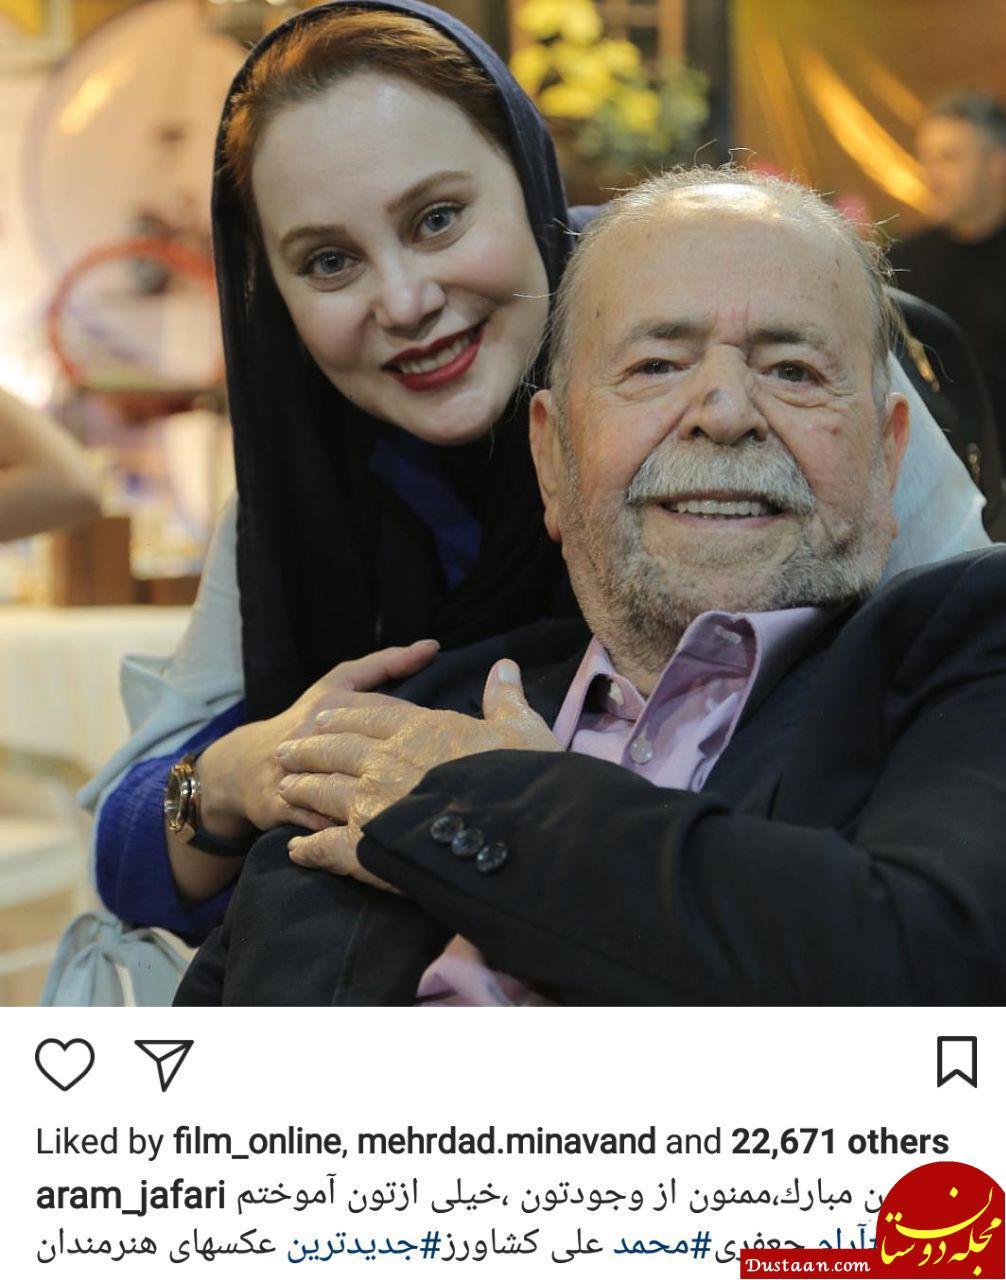 www.dustaan.com تصاویری جالب و دیدنی از بازیگران ایرانی در اینستاگرام «667»